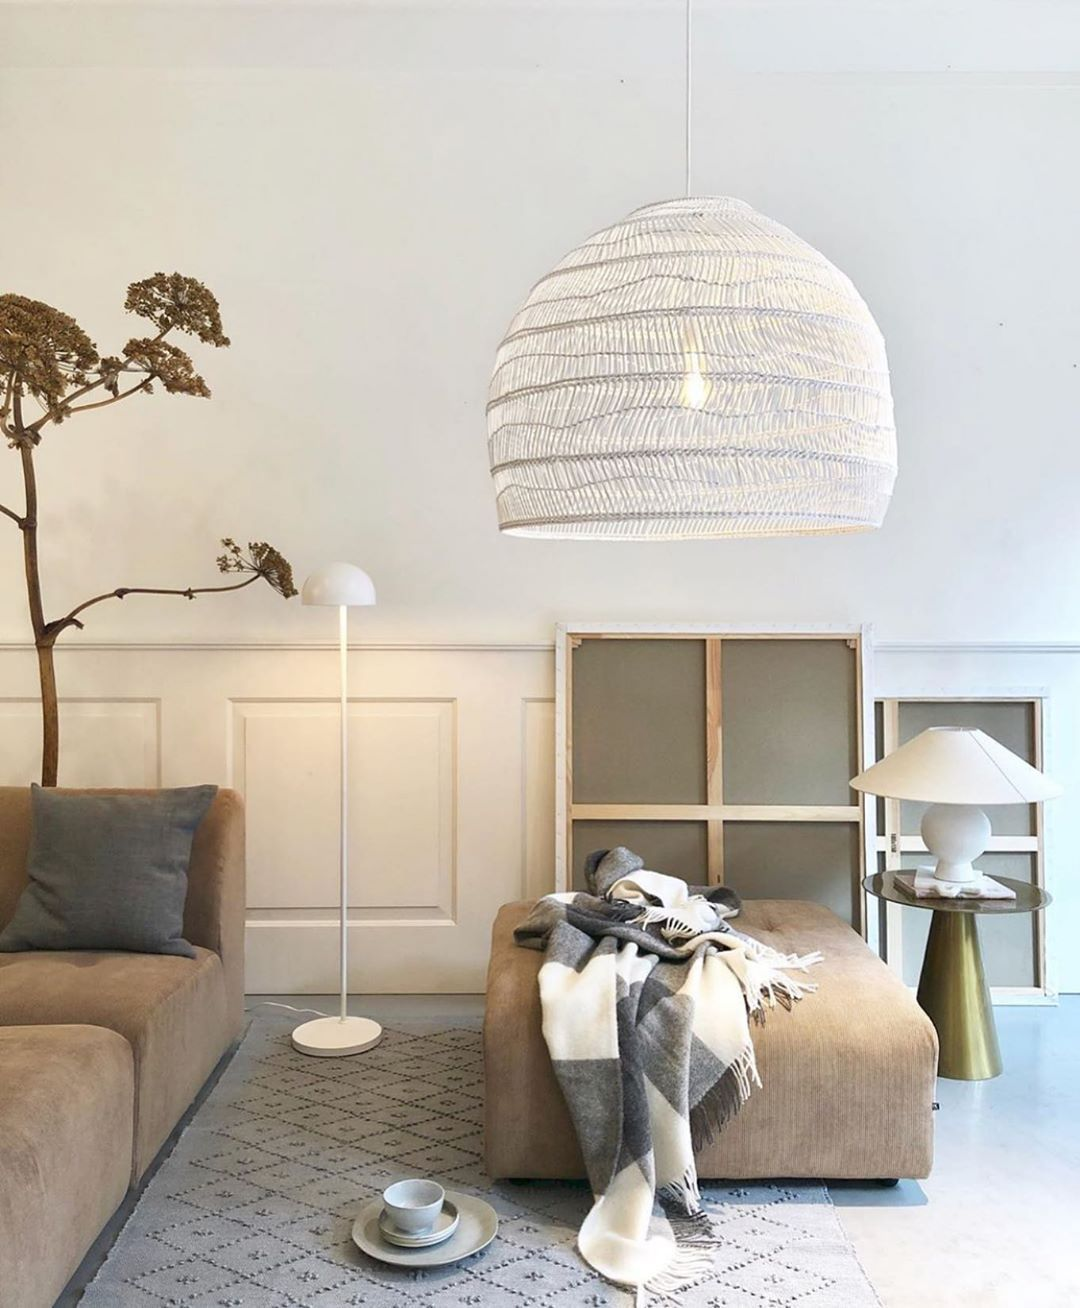 House Of Orange Hk Living On Instagram In Case You Haven T Heard Our Famous Hkli In 2020 Ceiling Lights Living Room White Hanging Light Living Room Scandinavian